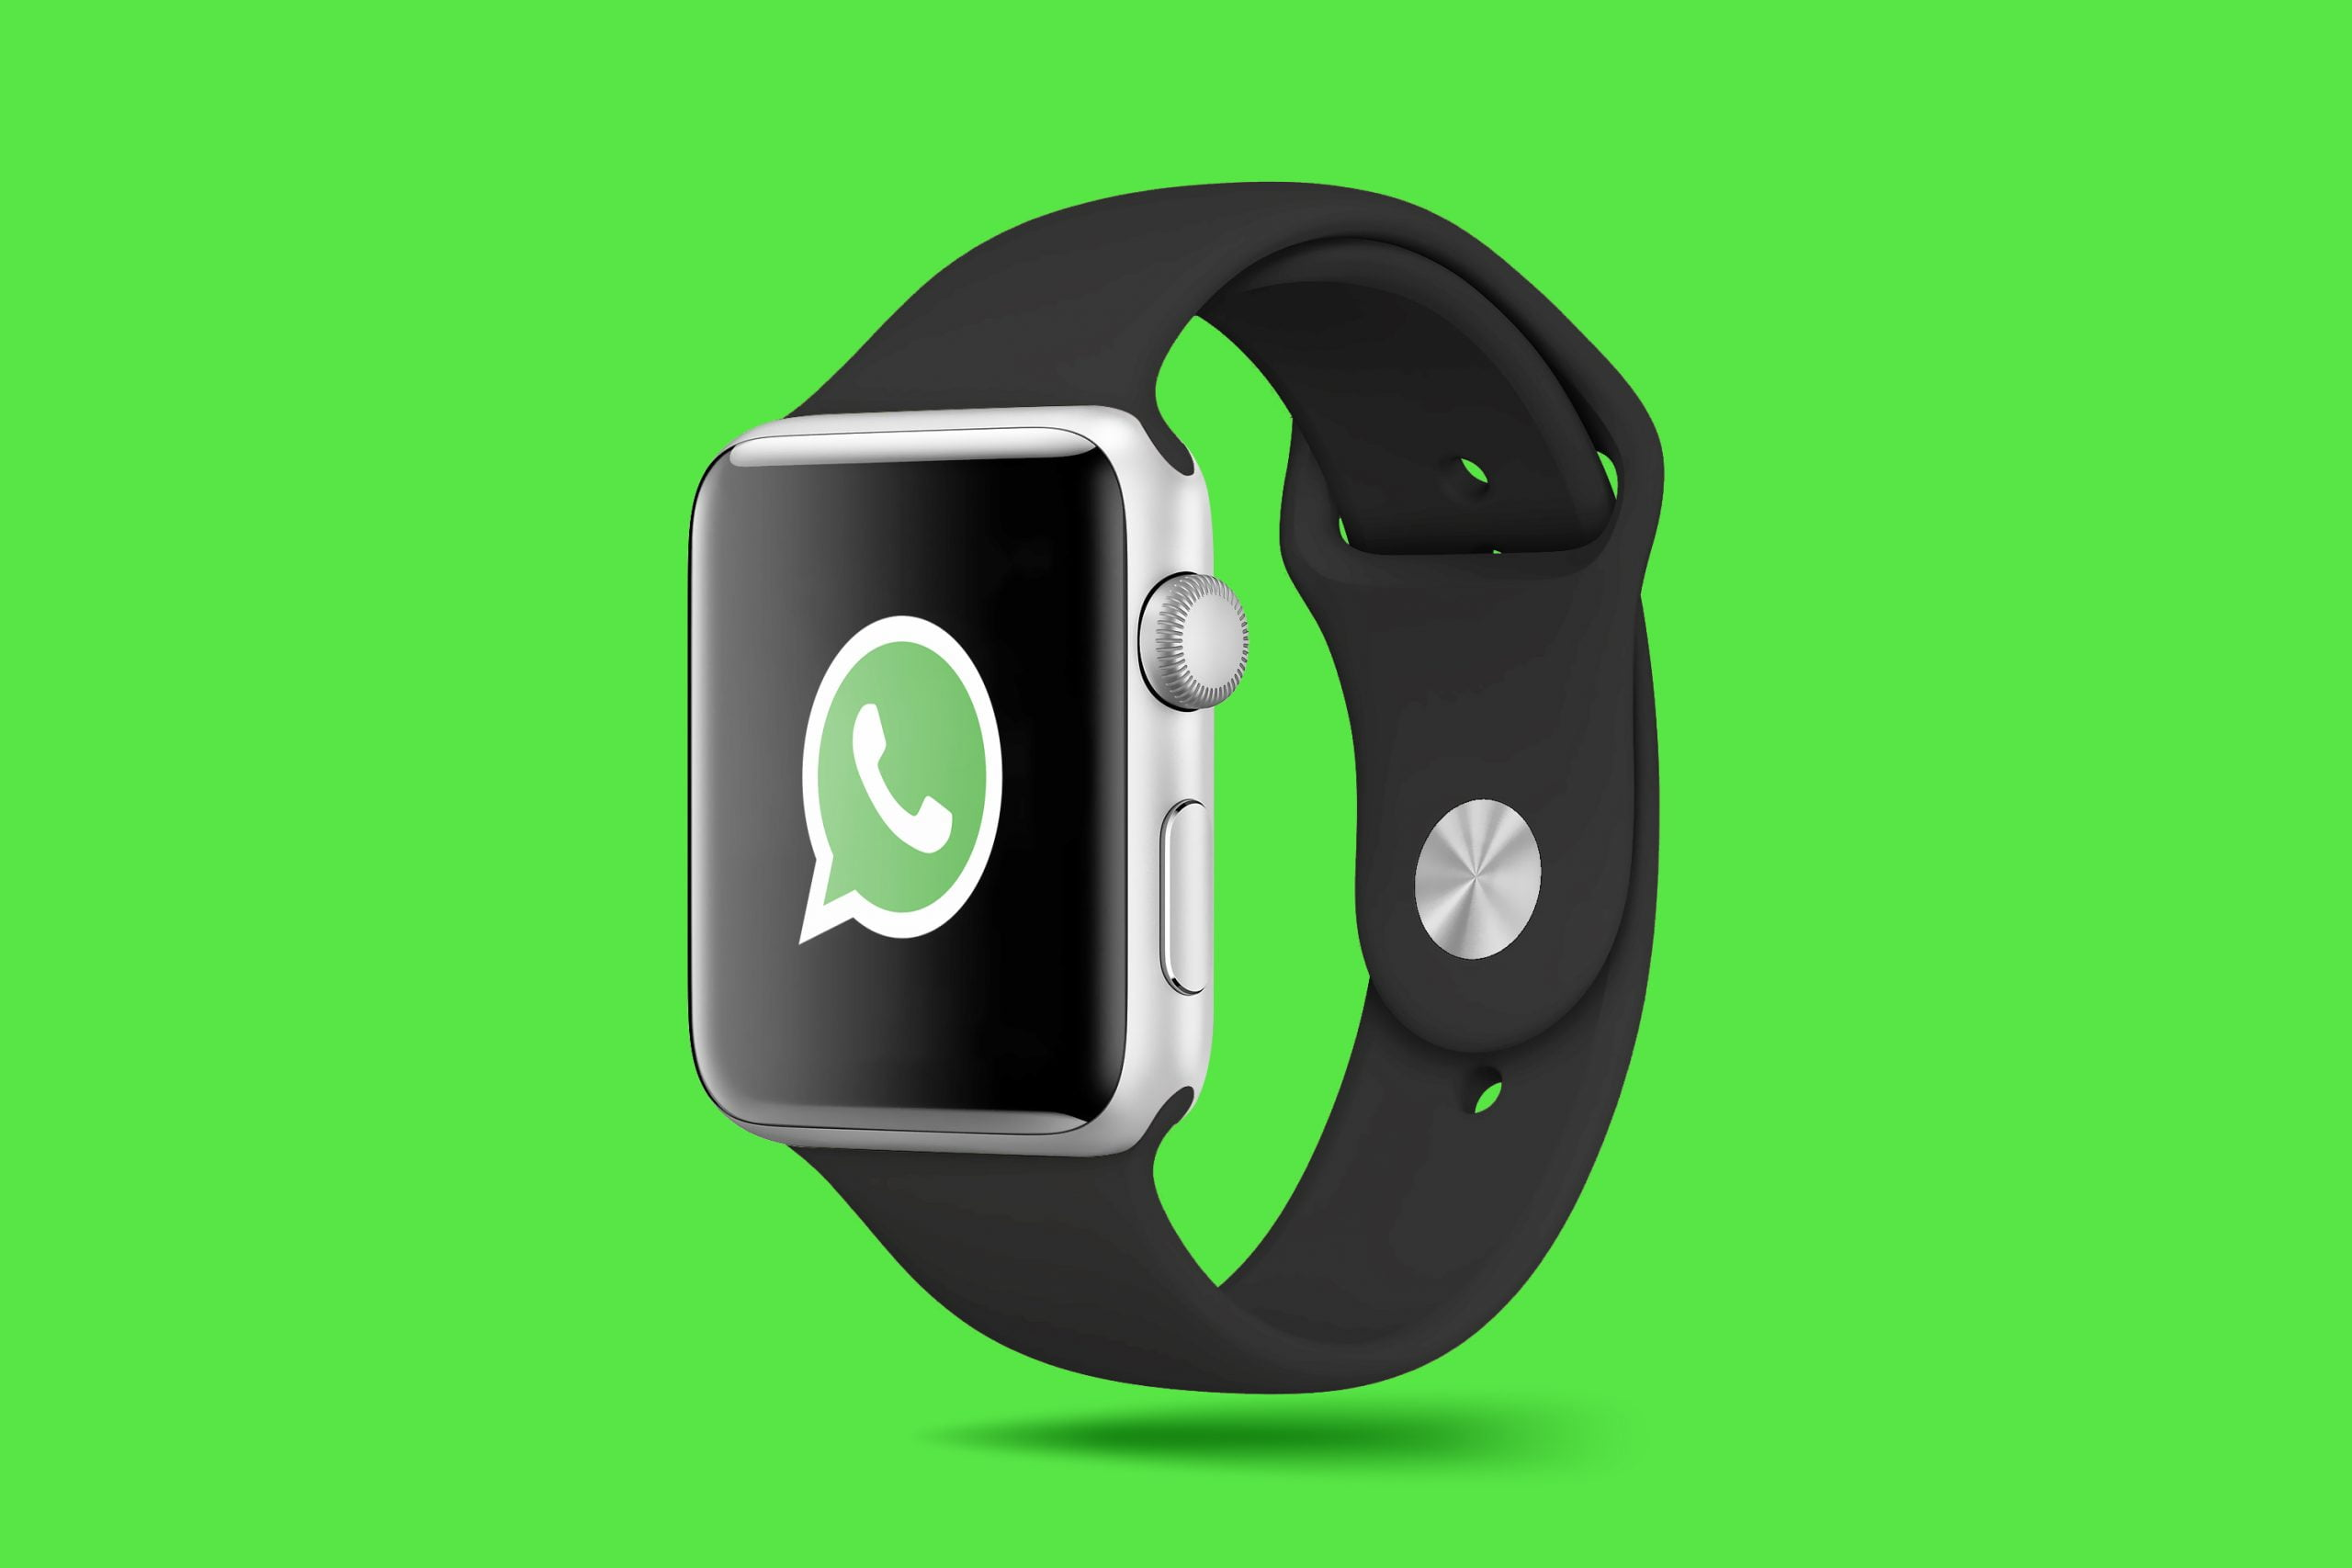 Smart Watch Mockup Design 2